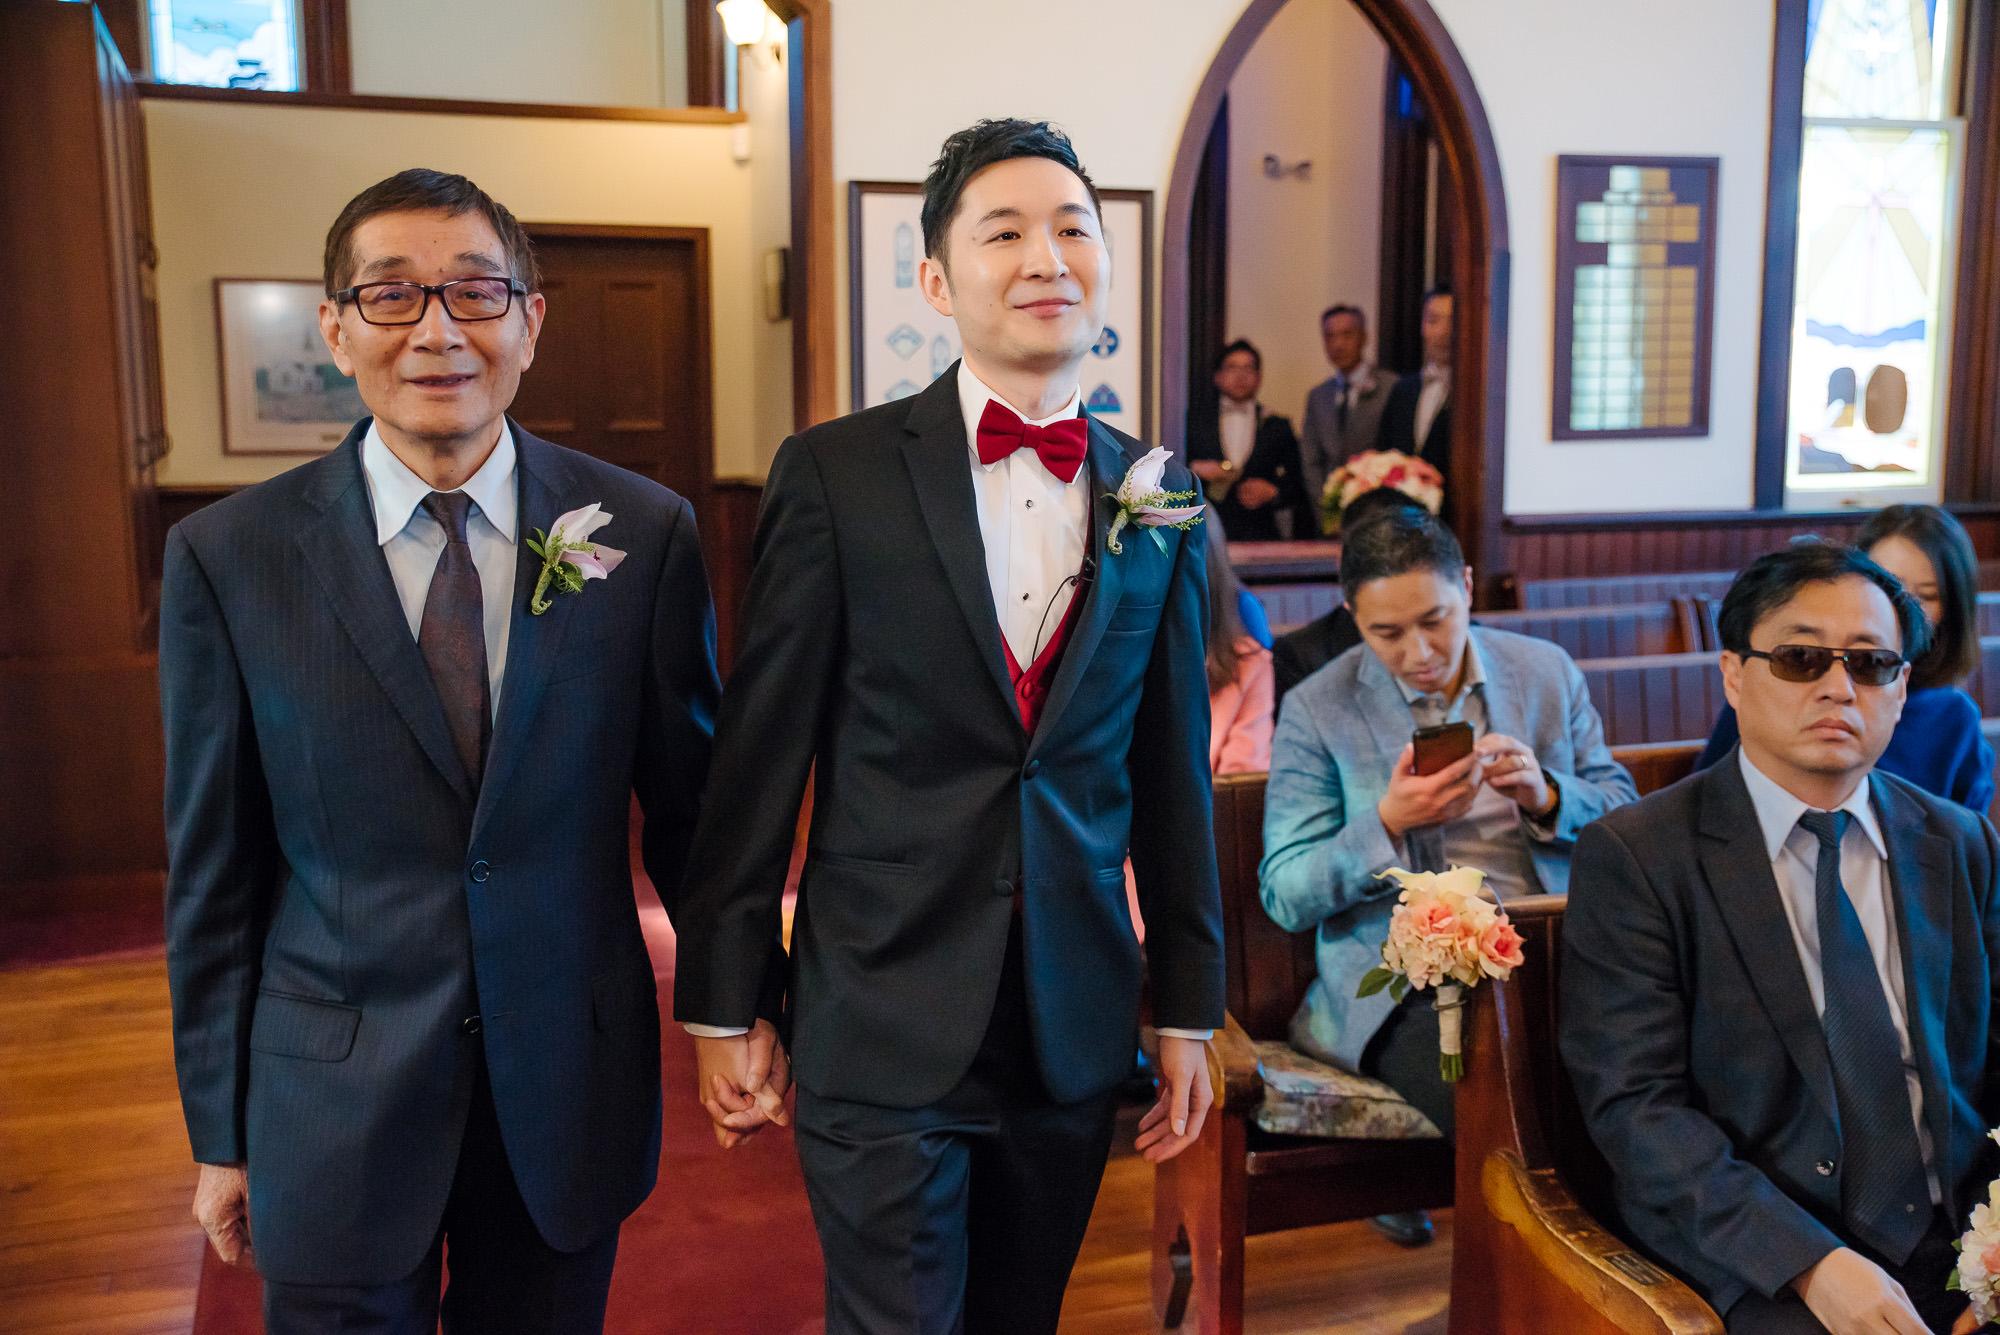 minoru_chapel_richmond_wedding_ceremony 1601411.jpg